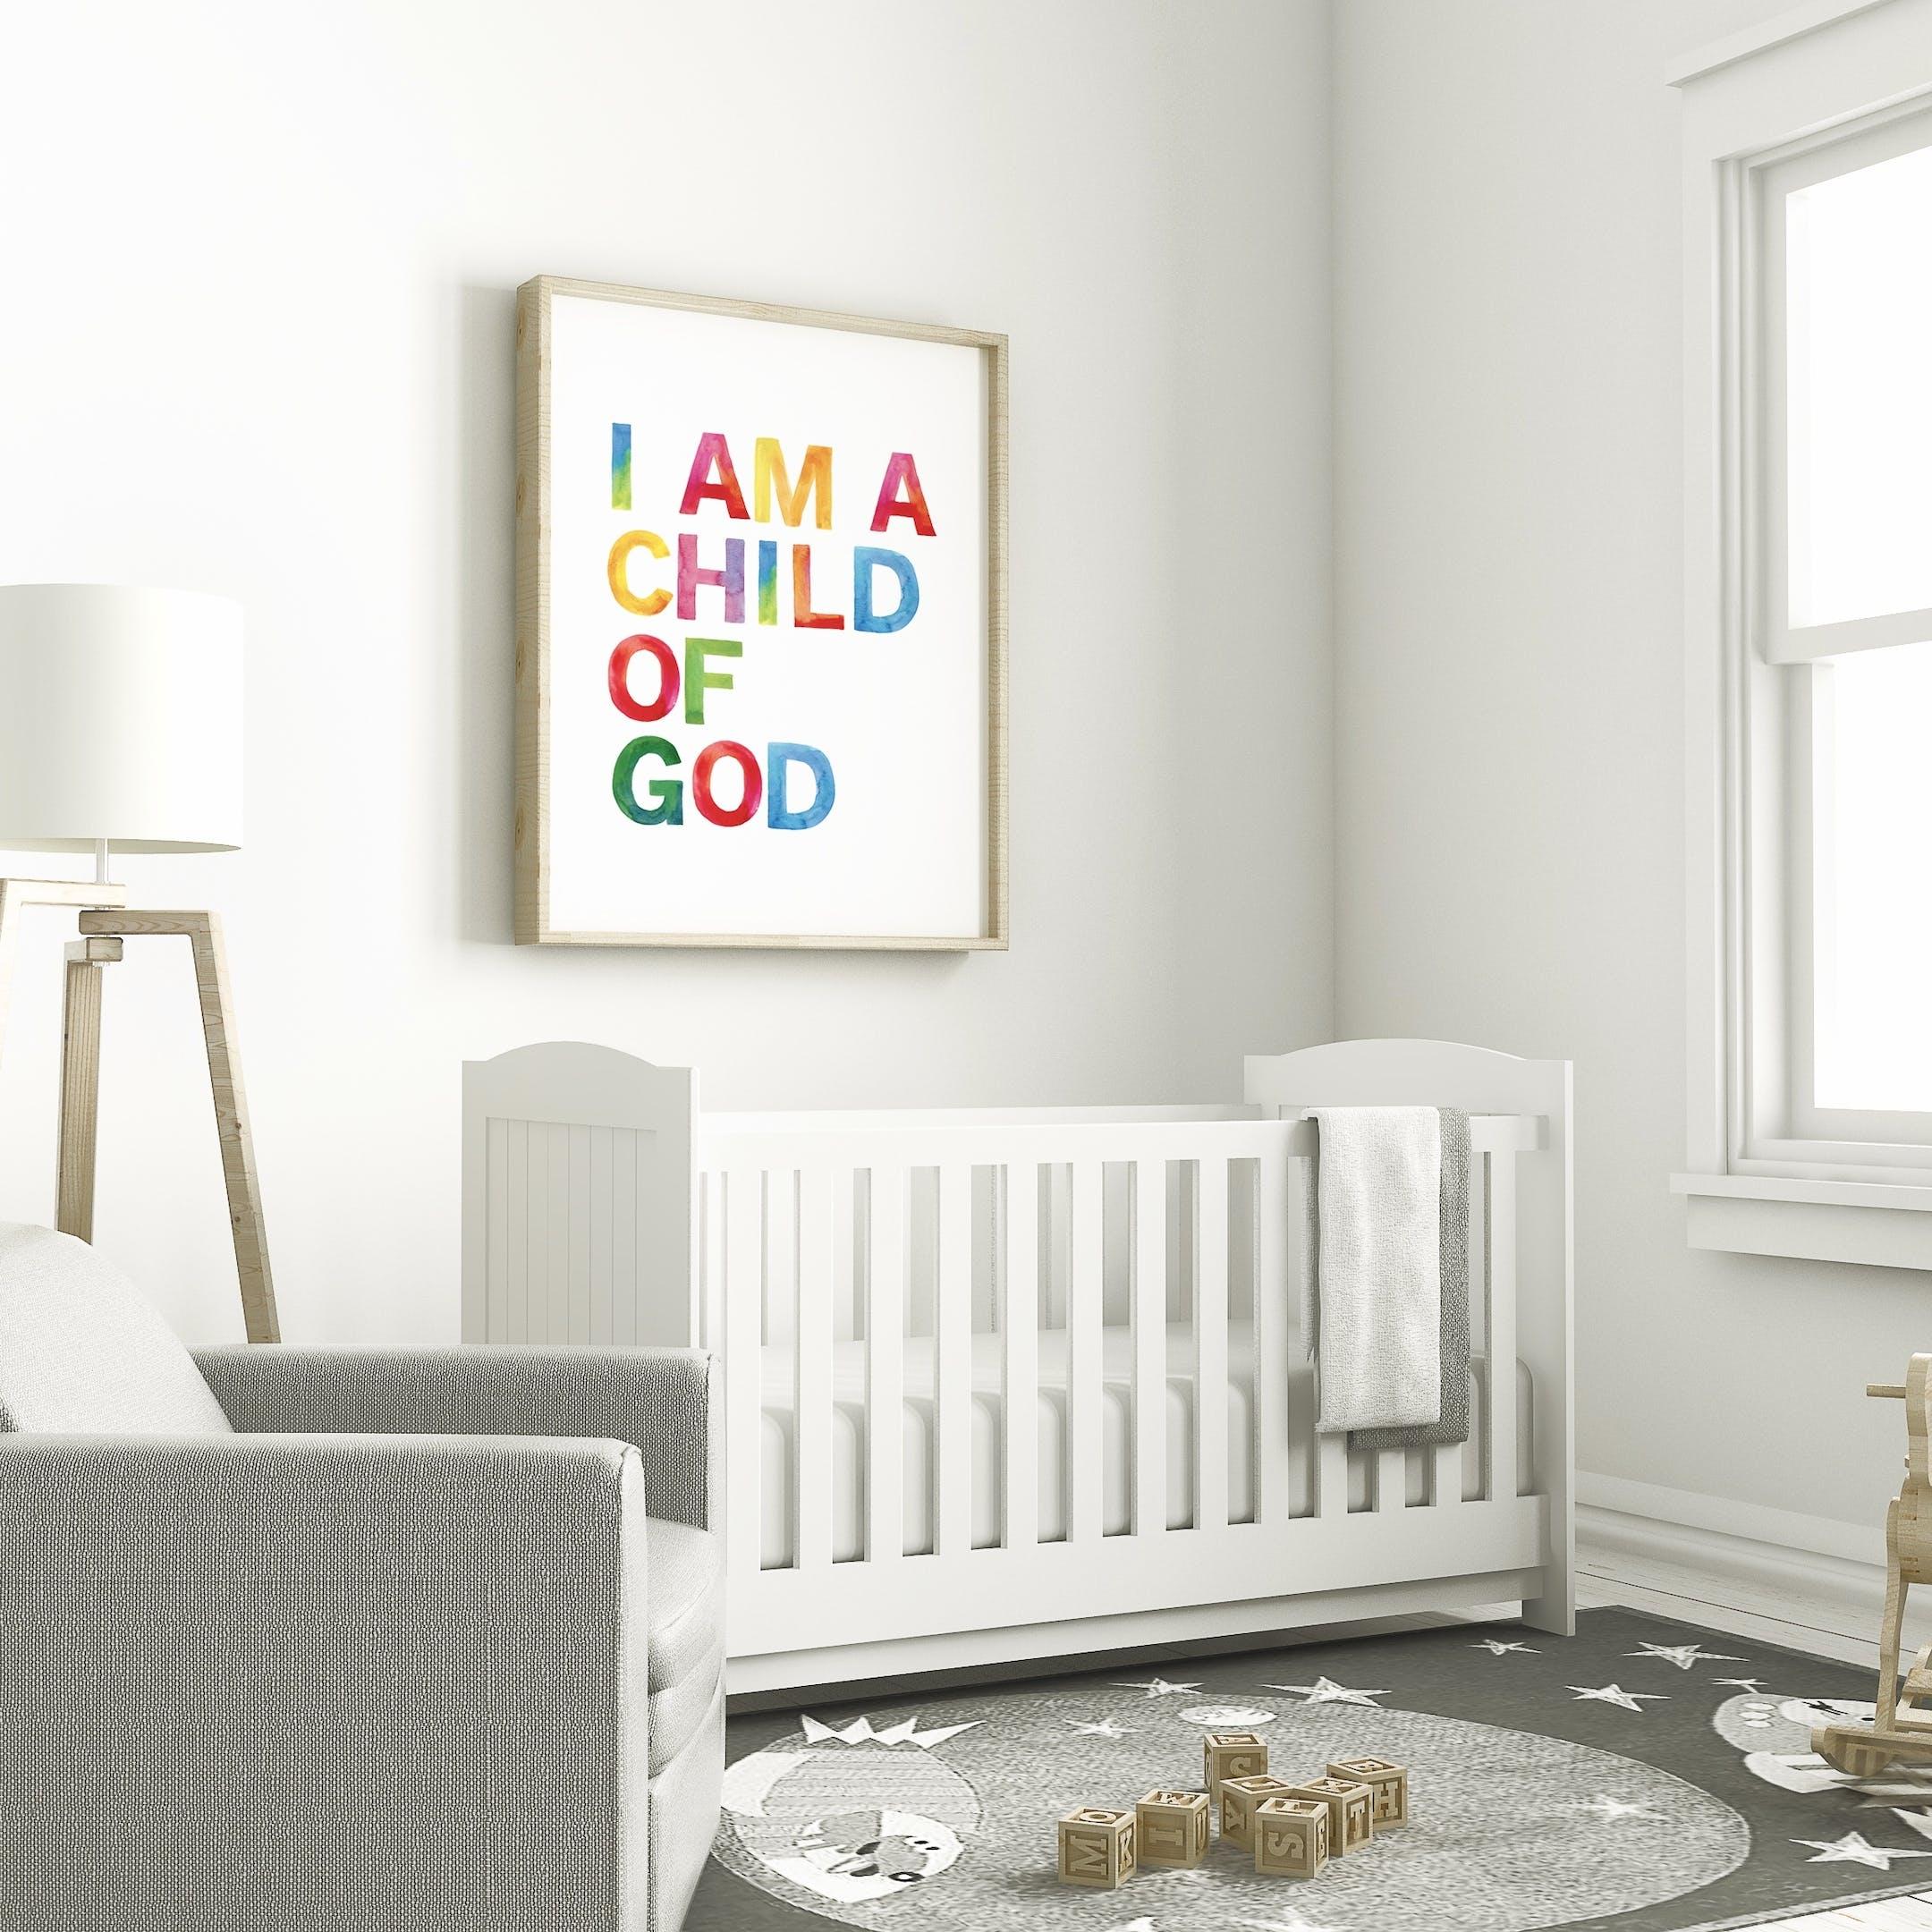 I Am A Child Of God Christian Nursery Print - Izzy and Pop